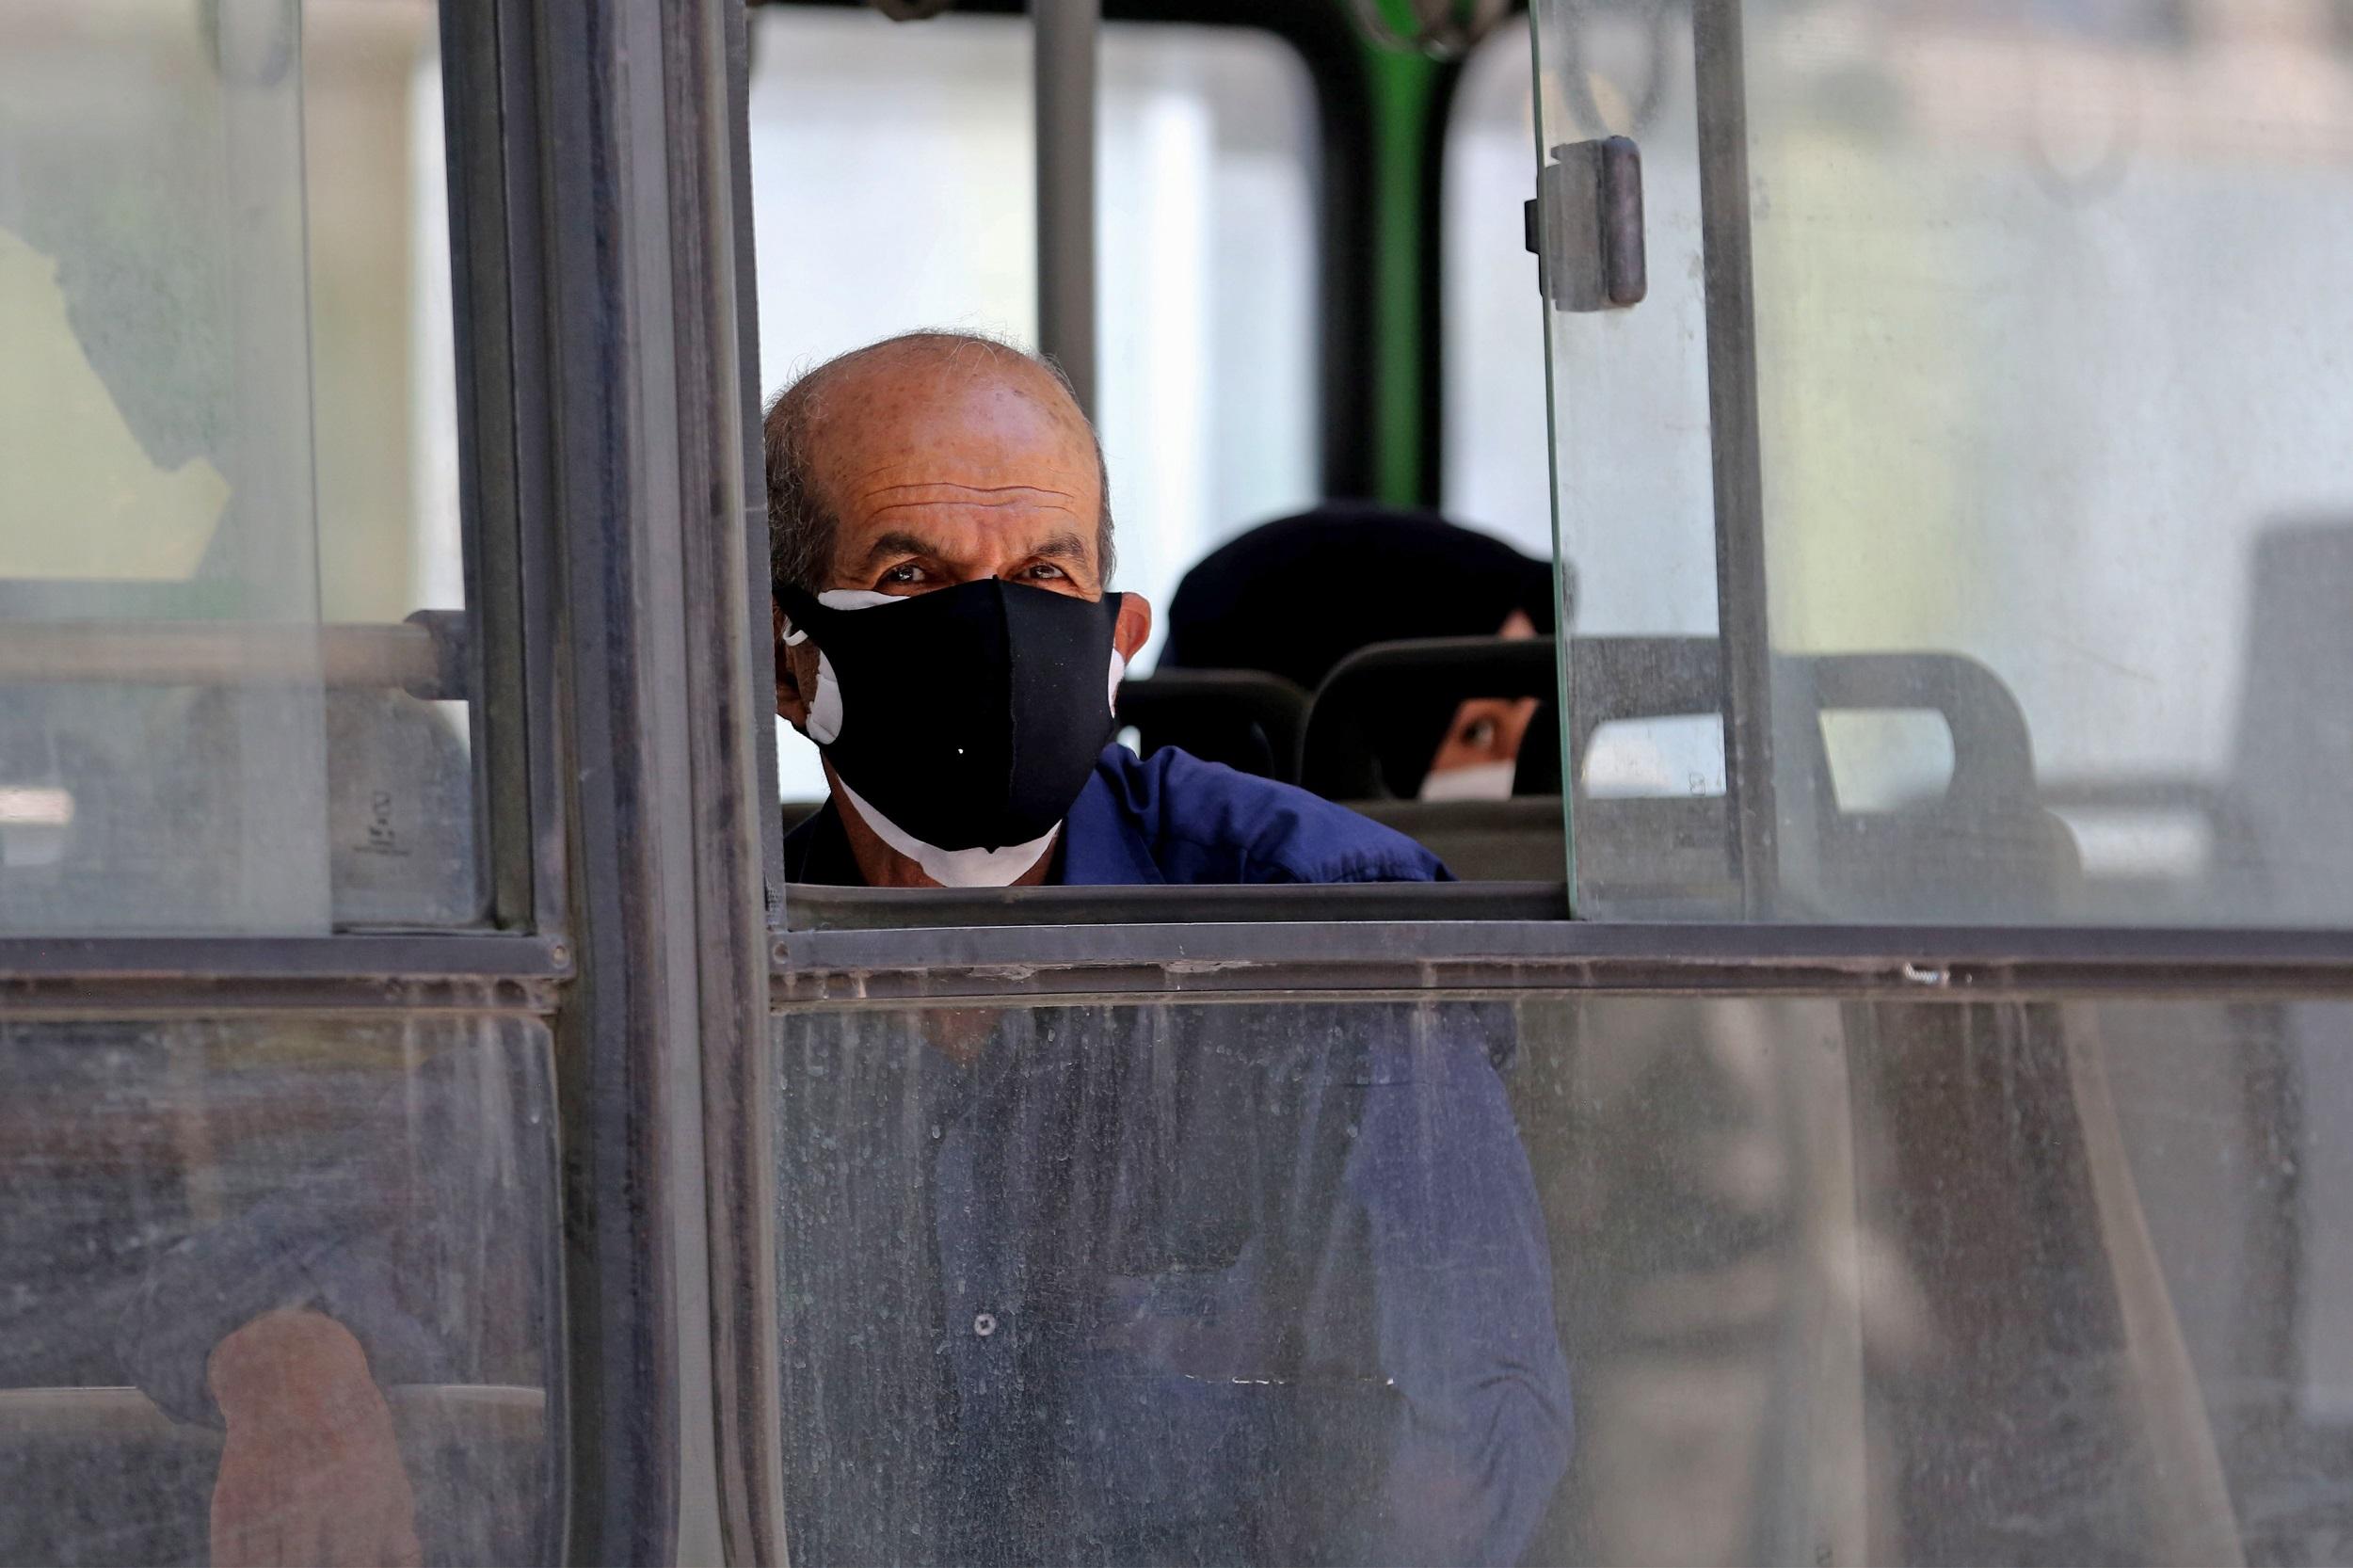 World Health Organization chief warns against 'politicizing' pandemic